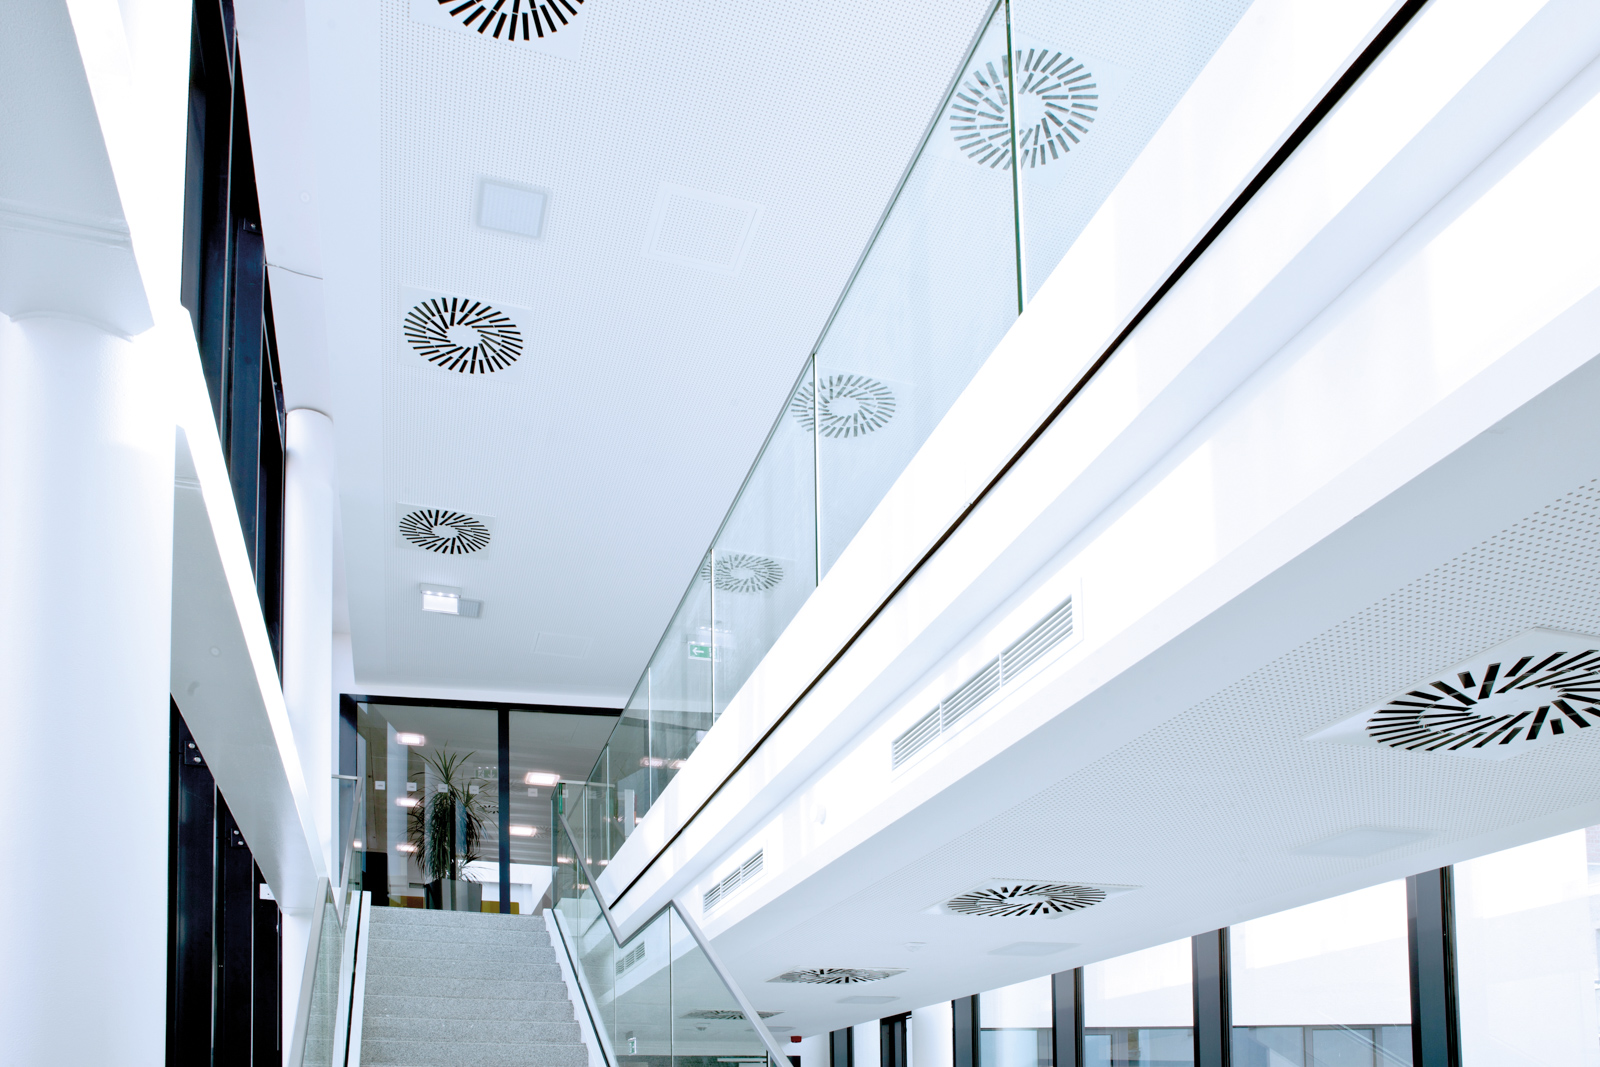 04_Bürogebäude ÖWG Moserhofgasse_cmyk_k